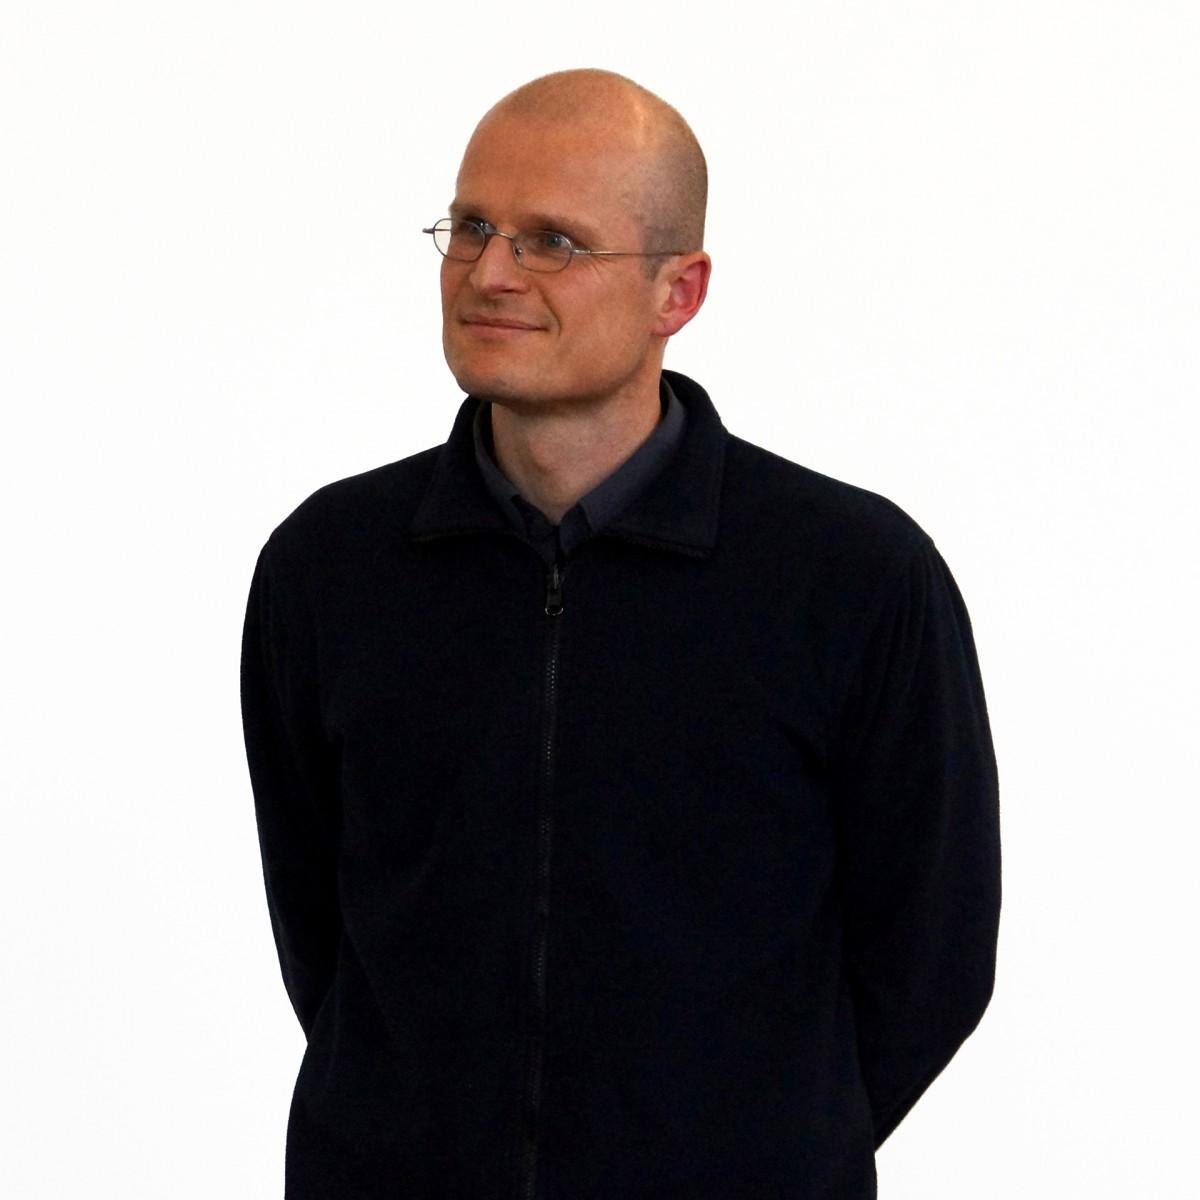 Jürgen Krause (Bild 13): Künstler im Gespräch – Kunsthaus Nürnberg (2015)